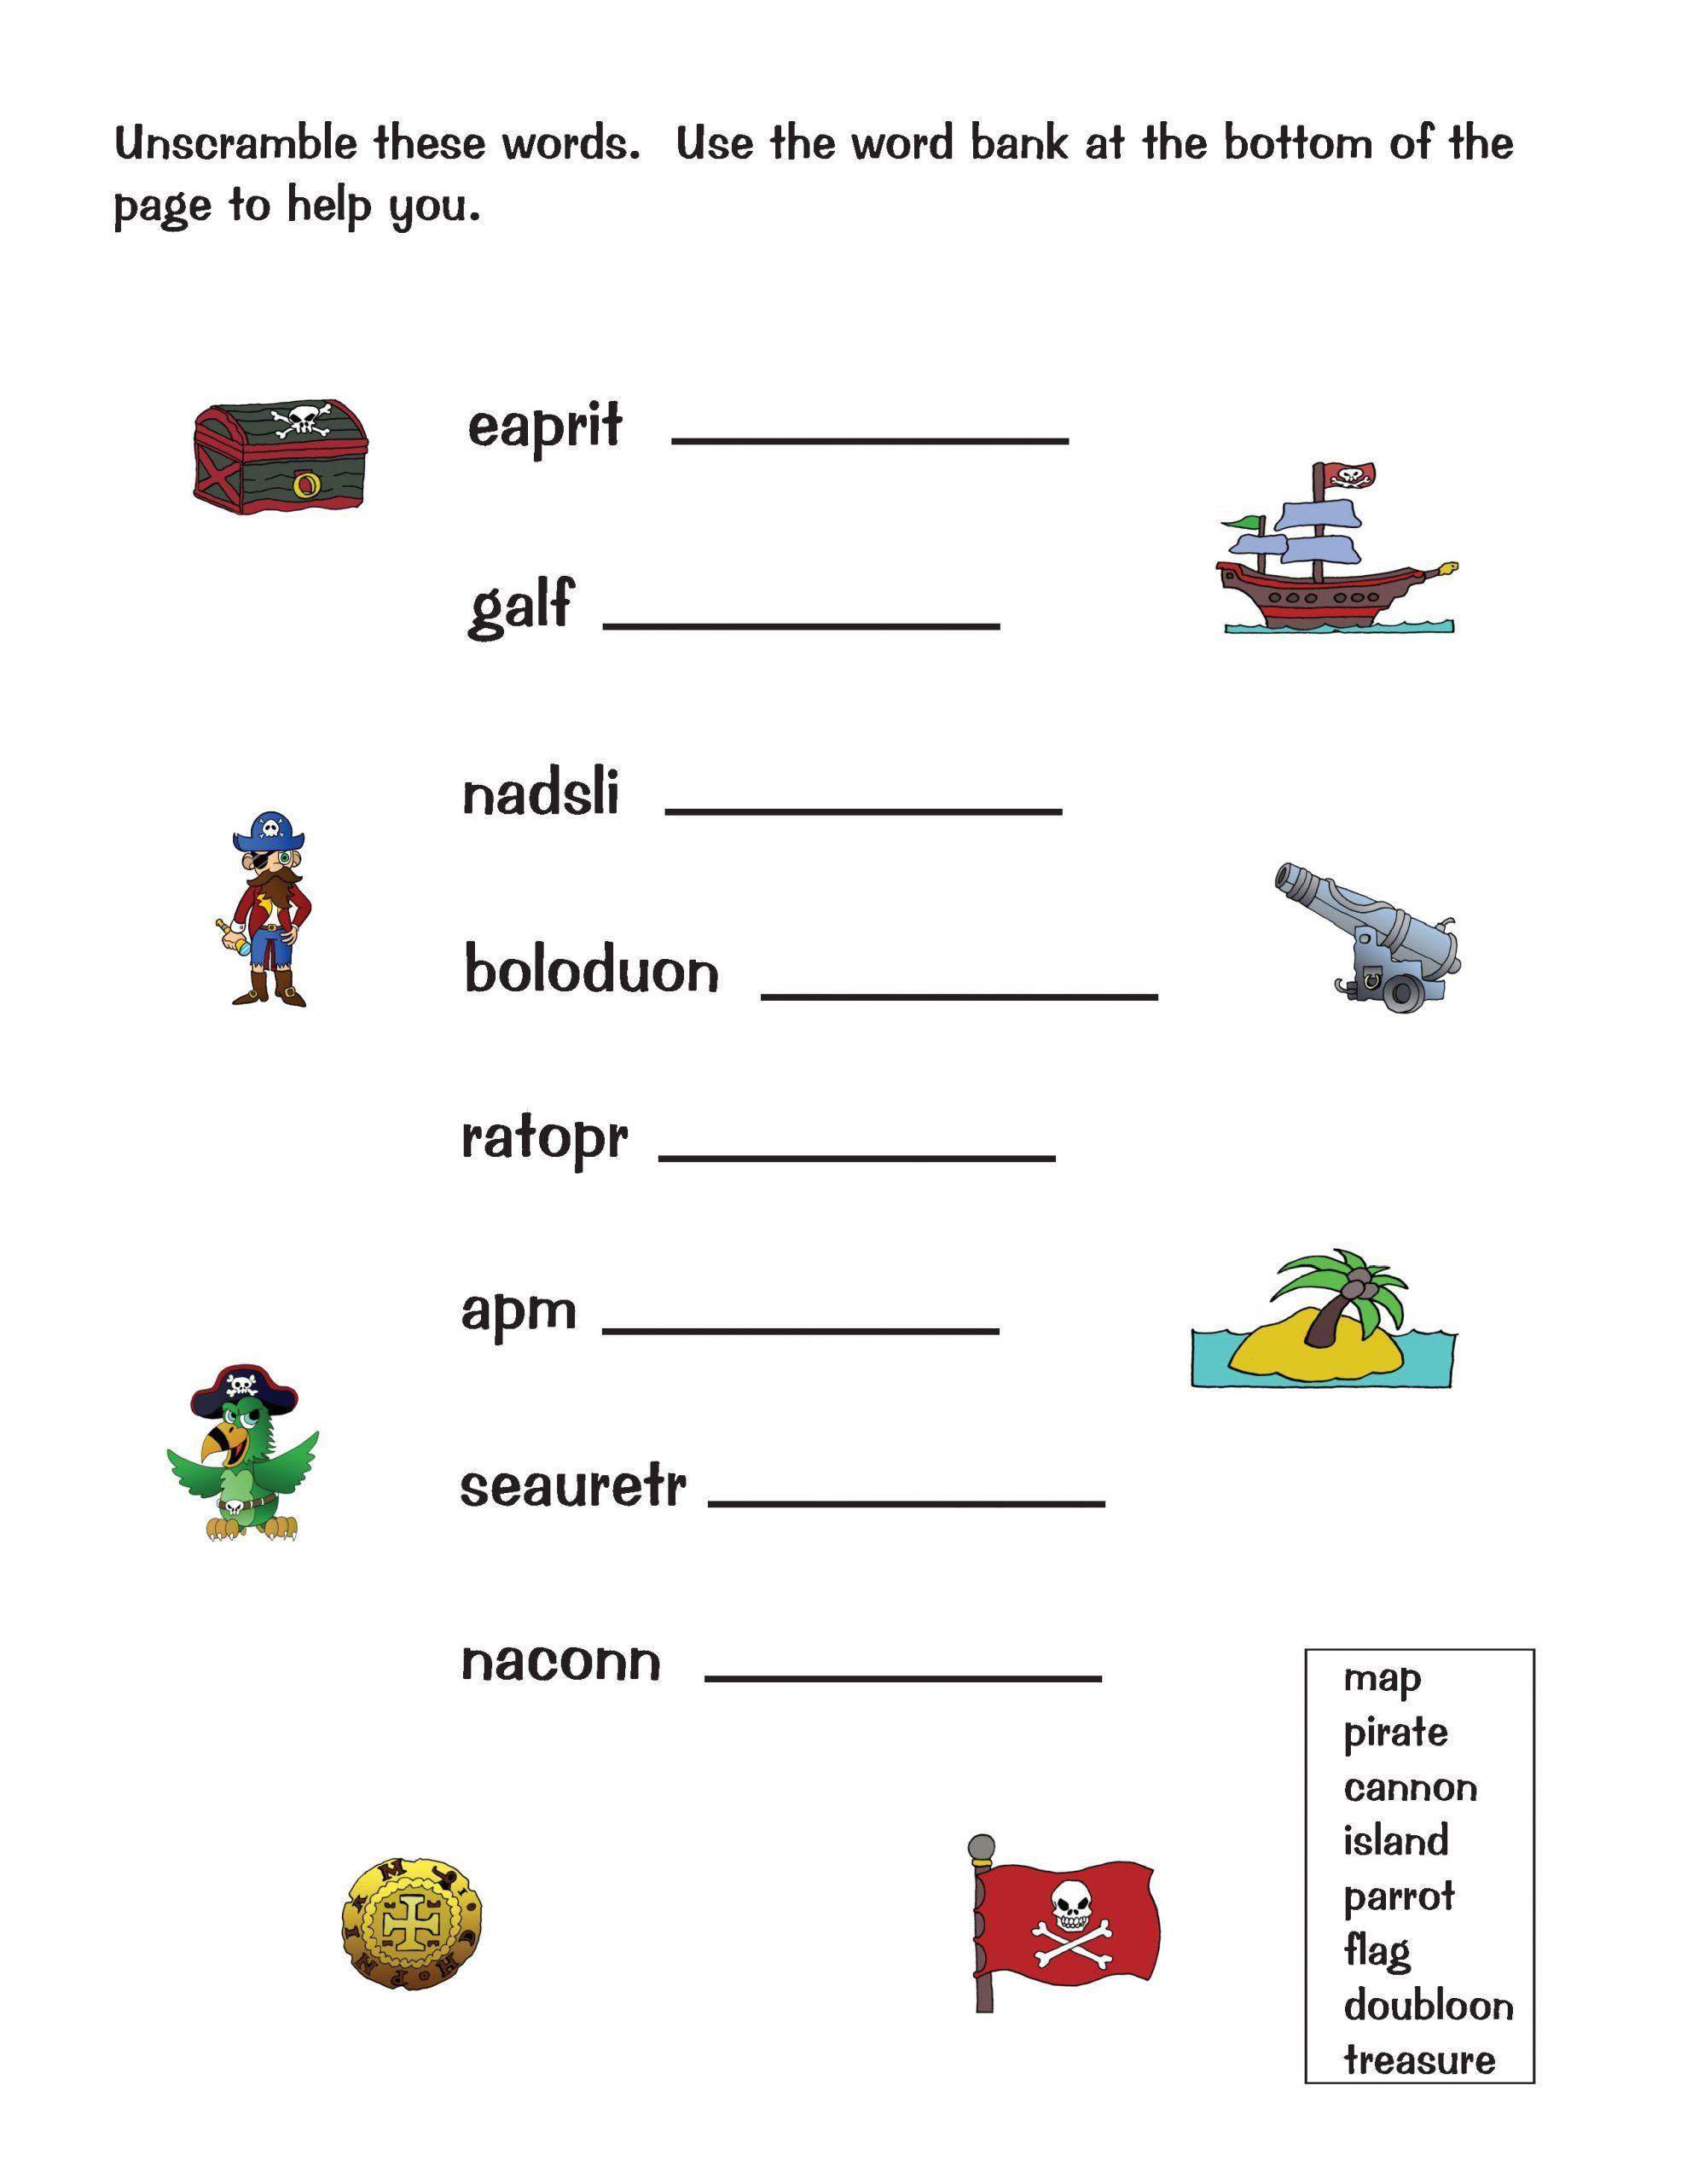 More Pirate Worksheet Fun From The Adventuresofscubajack Pirates2020 Activity Workbook Kids Story Books Kindergarten Learning Activities [ 2560 x 1978 Pixel ]